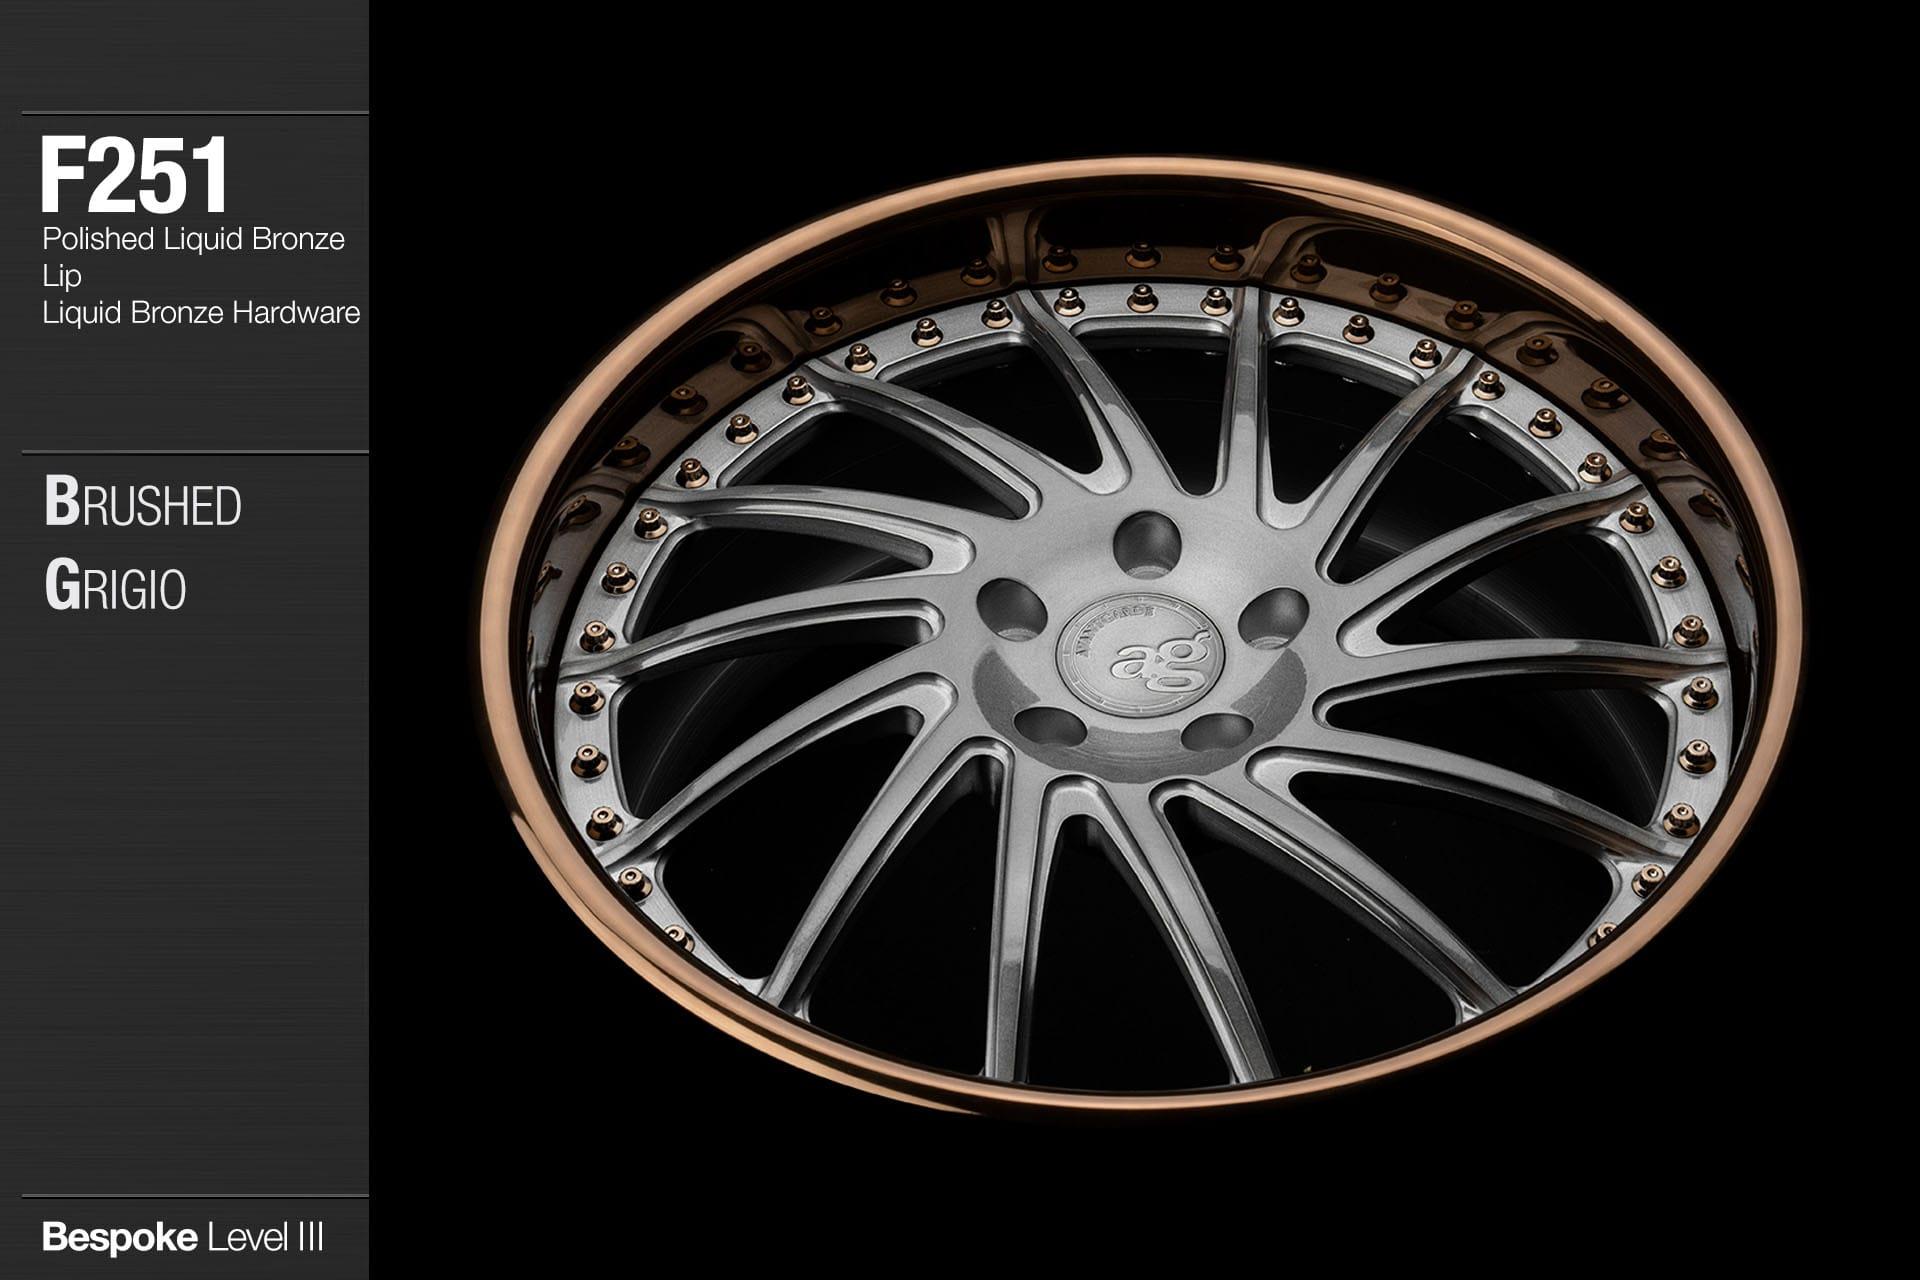 avant-garde-ag-wheels-f251-brushed-grigio-face-polished-liquid-bronze-lip-hardware-3-min